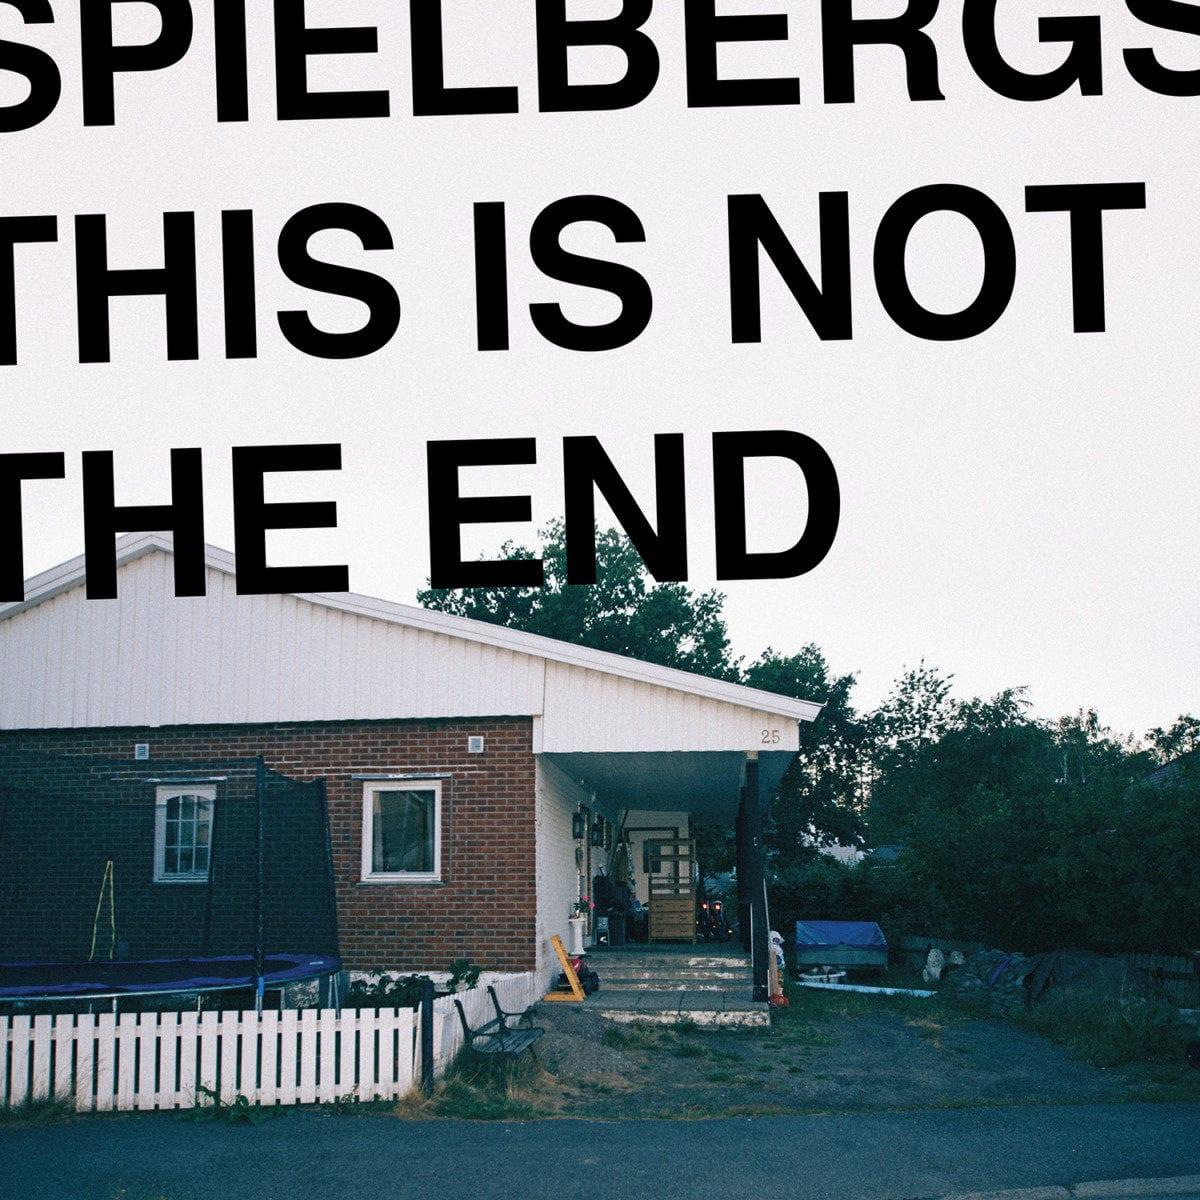 Spielbergs 4AM